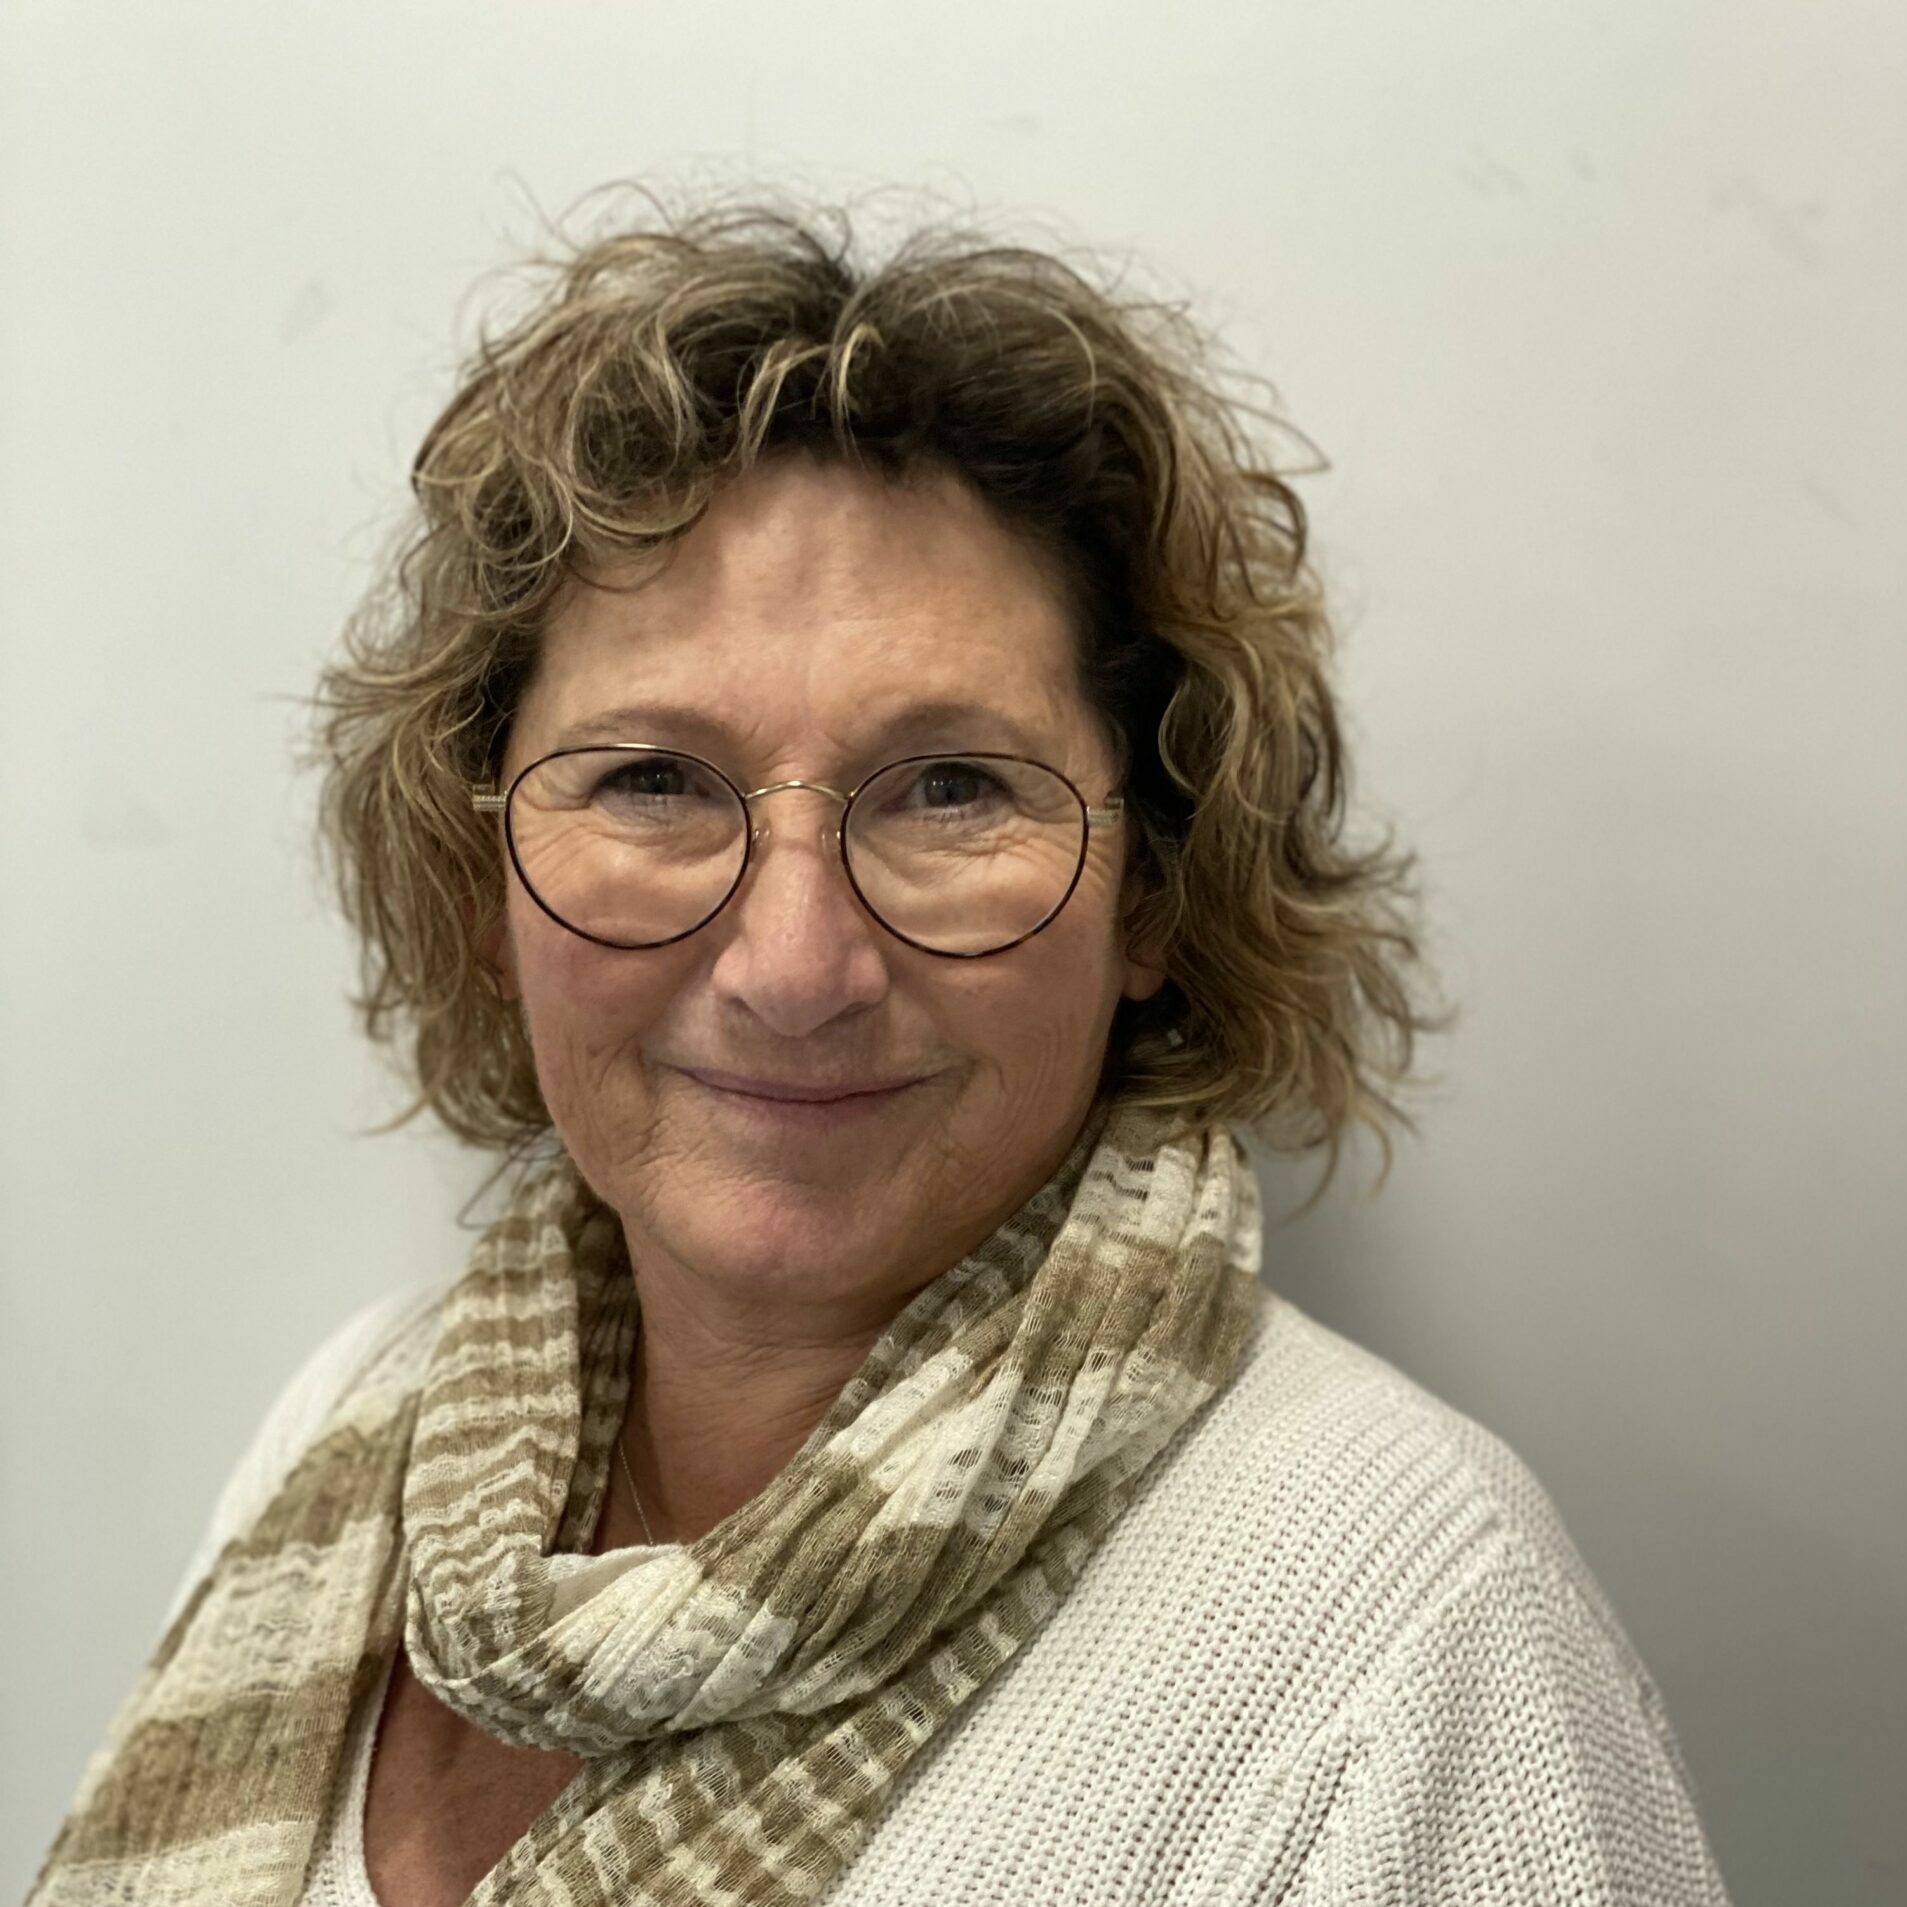 Rosanna Schleusener